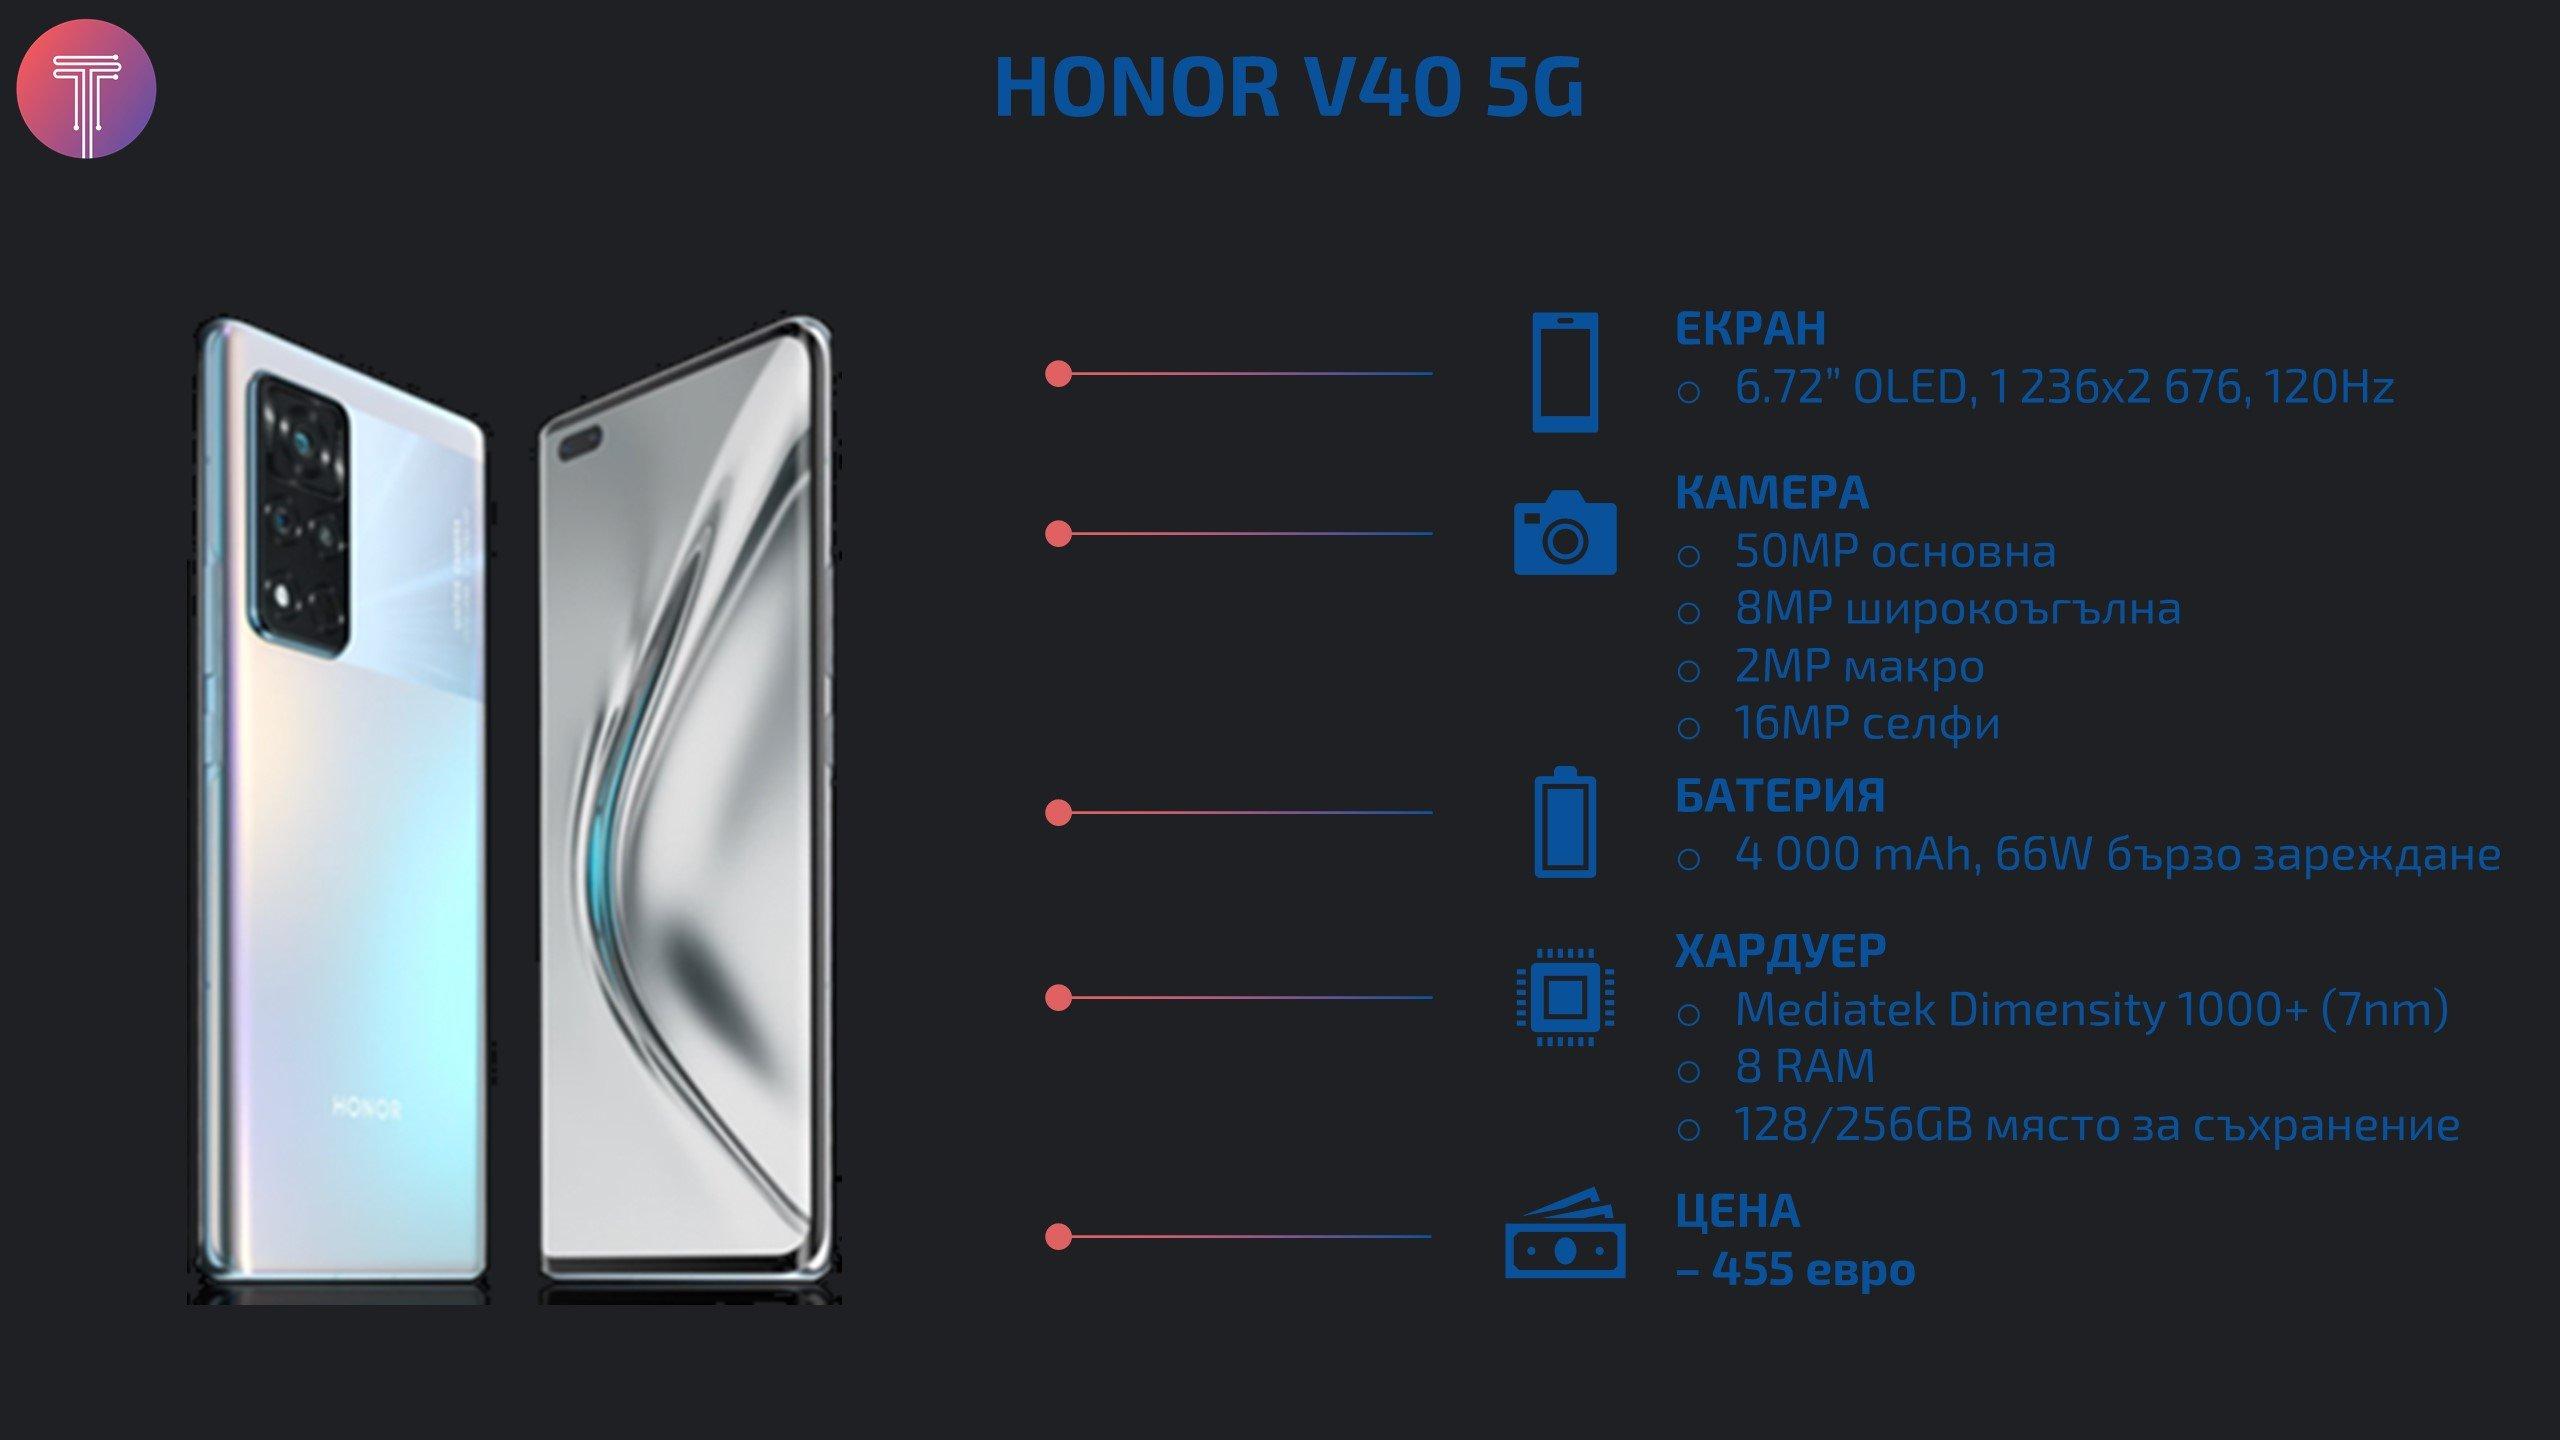 HONOR V40 5G stats